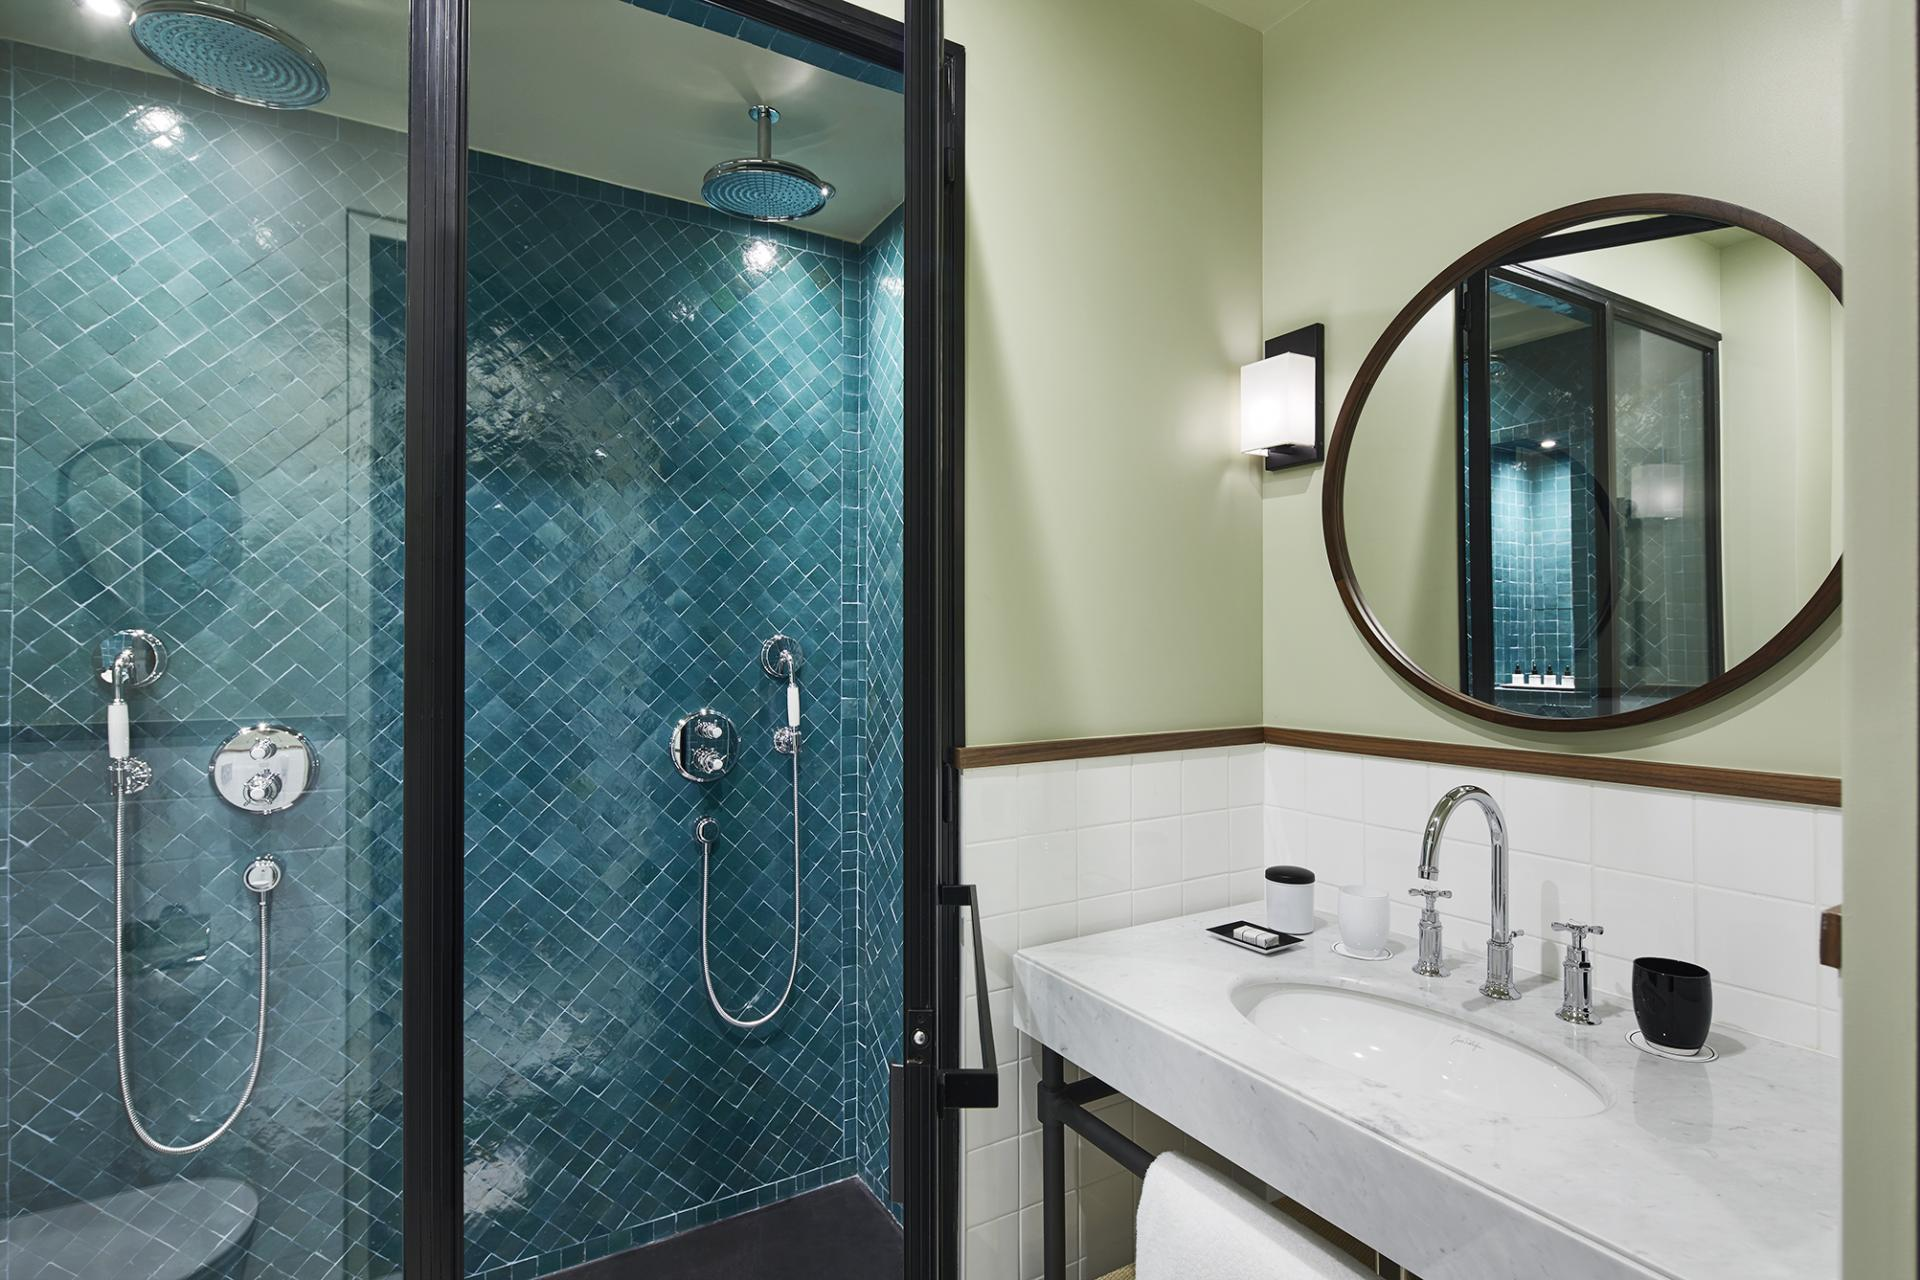 Le Roch Hotel & Spa - Chambres & Suites